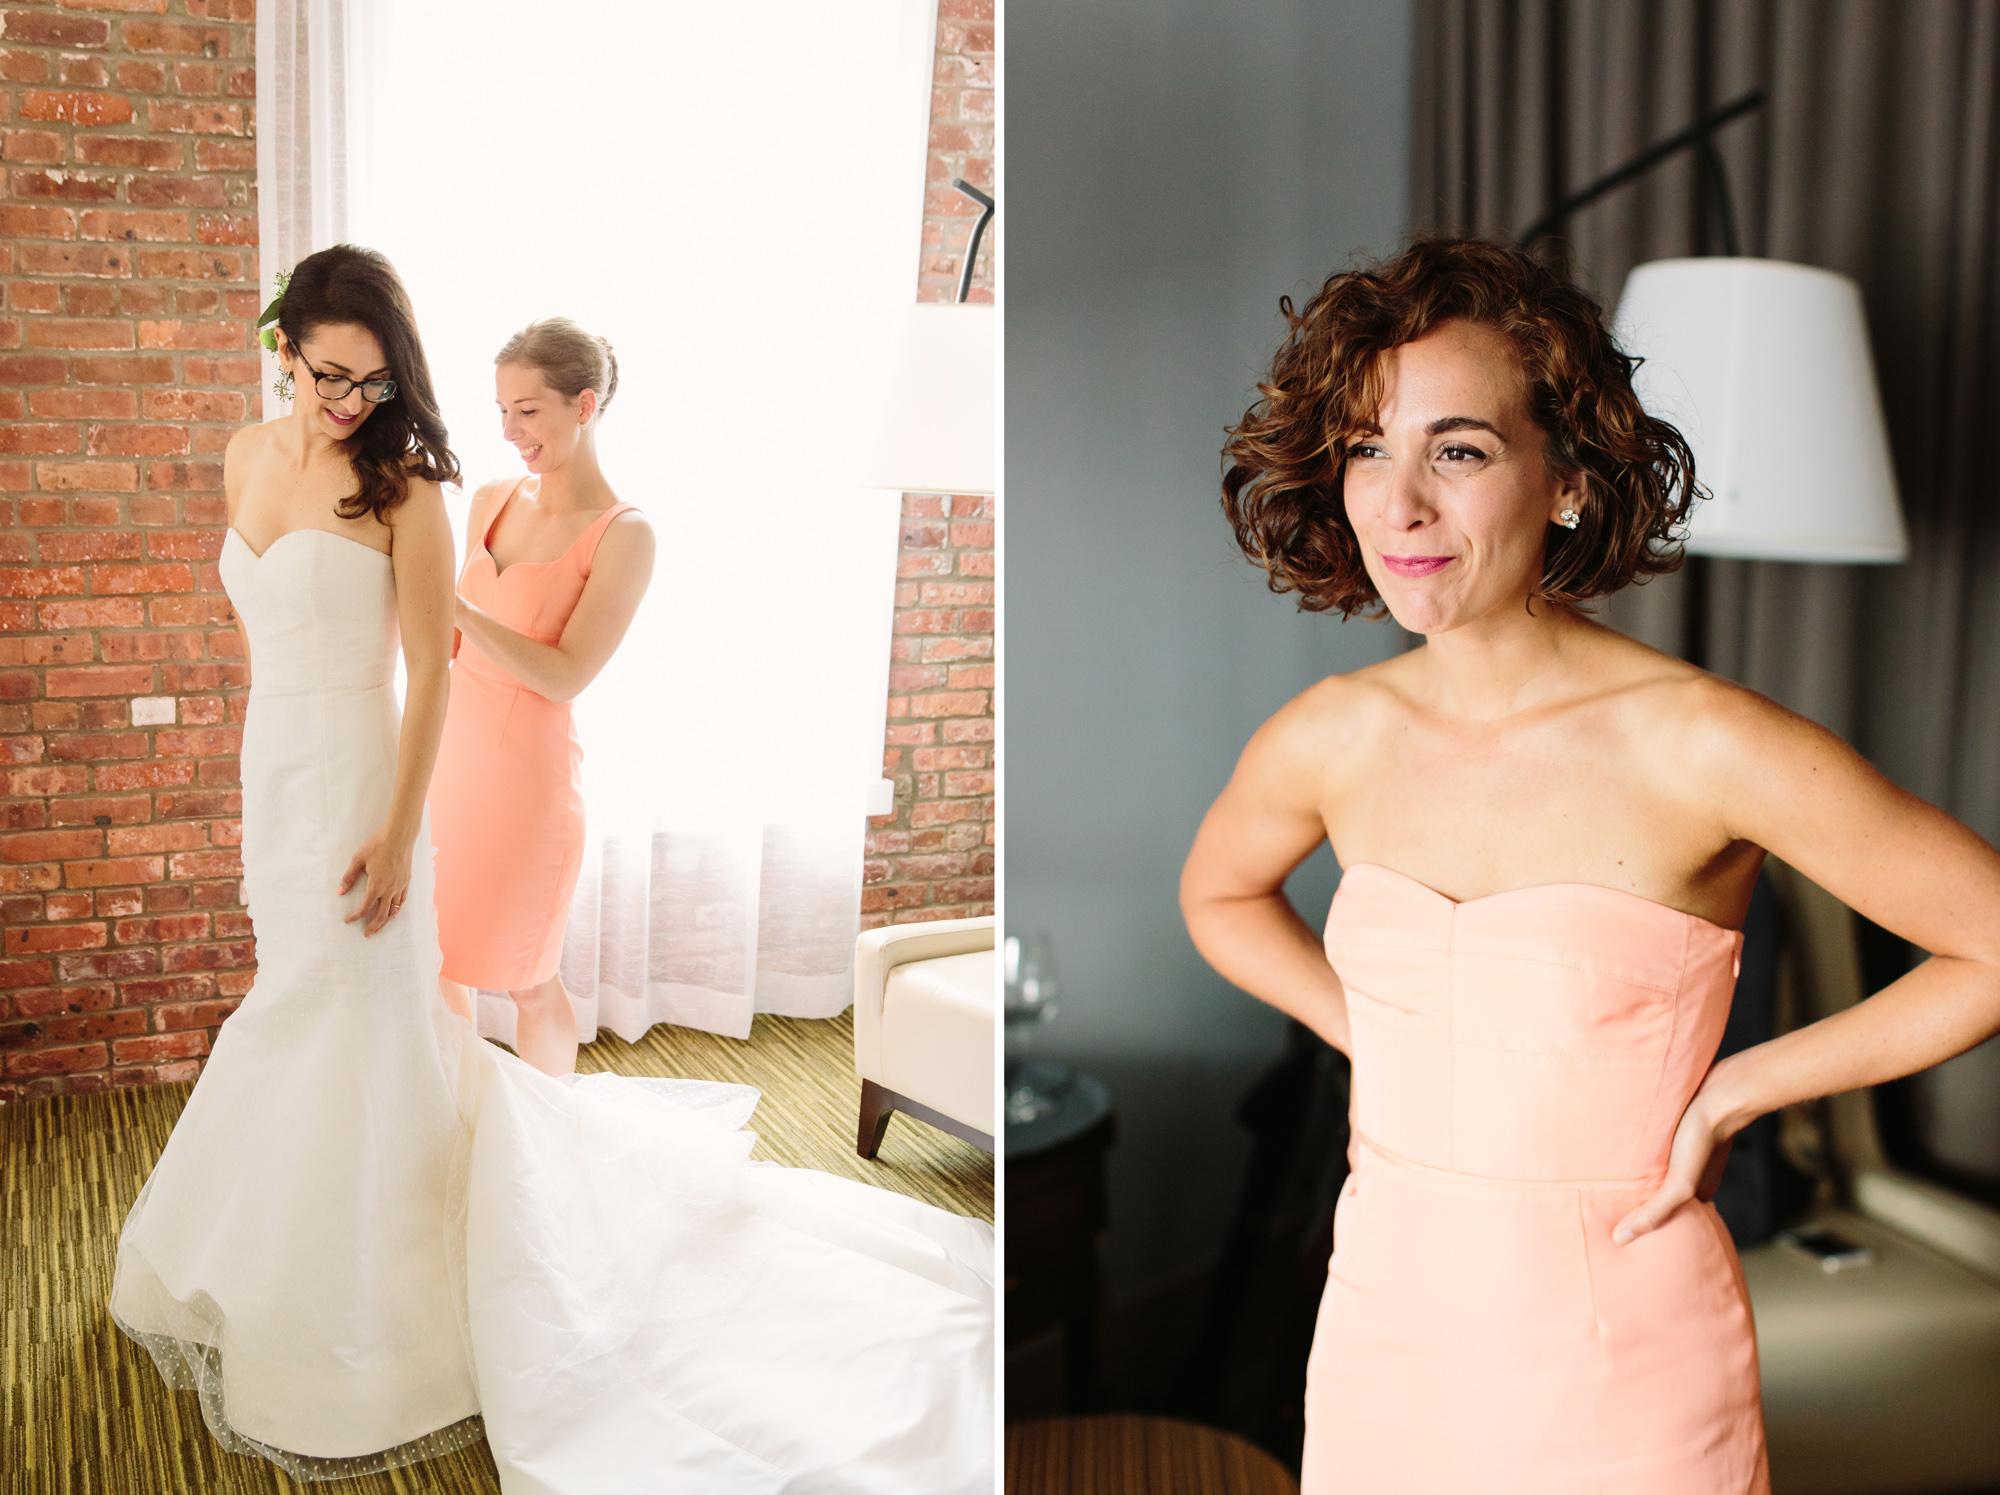 07_Kate_Sam_Picnic_House_Wedding_Brooklyn_NY_Tanya_Salazar_Photography.jpg